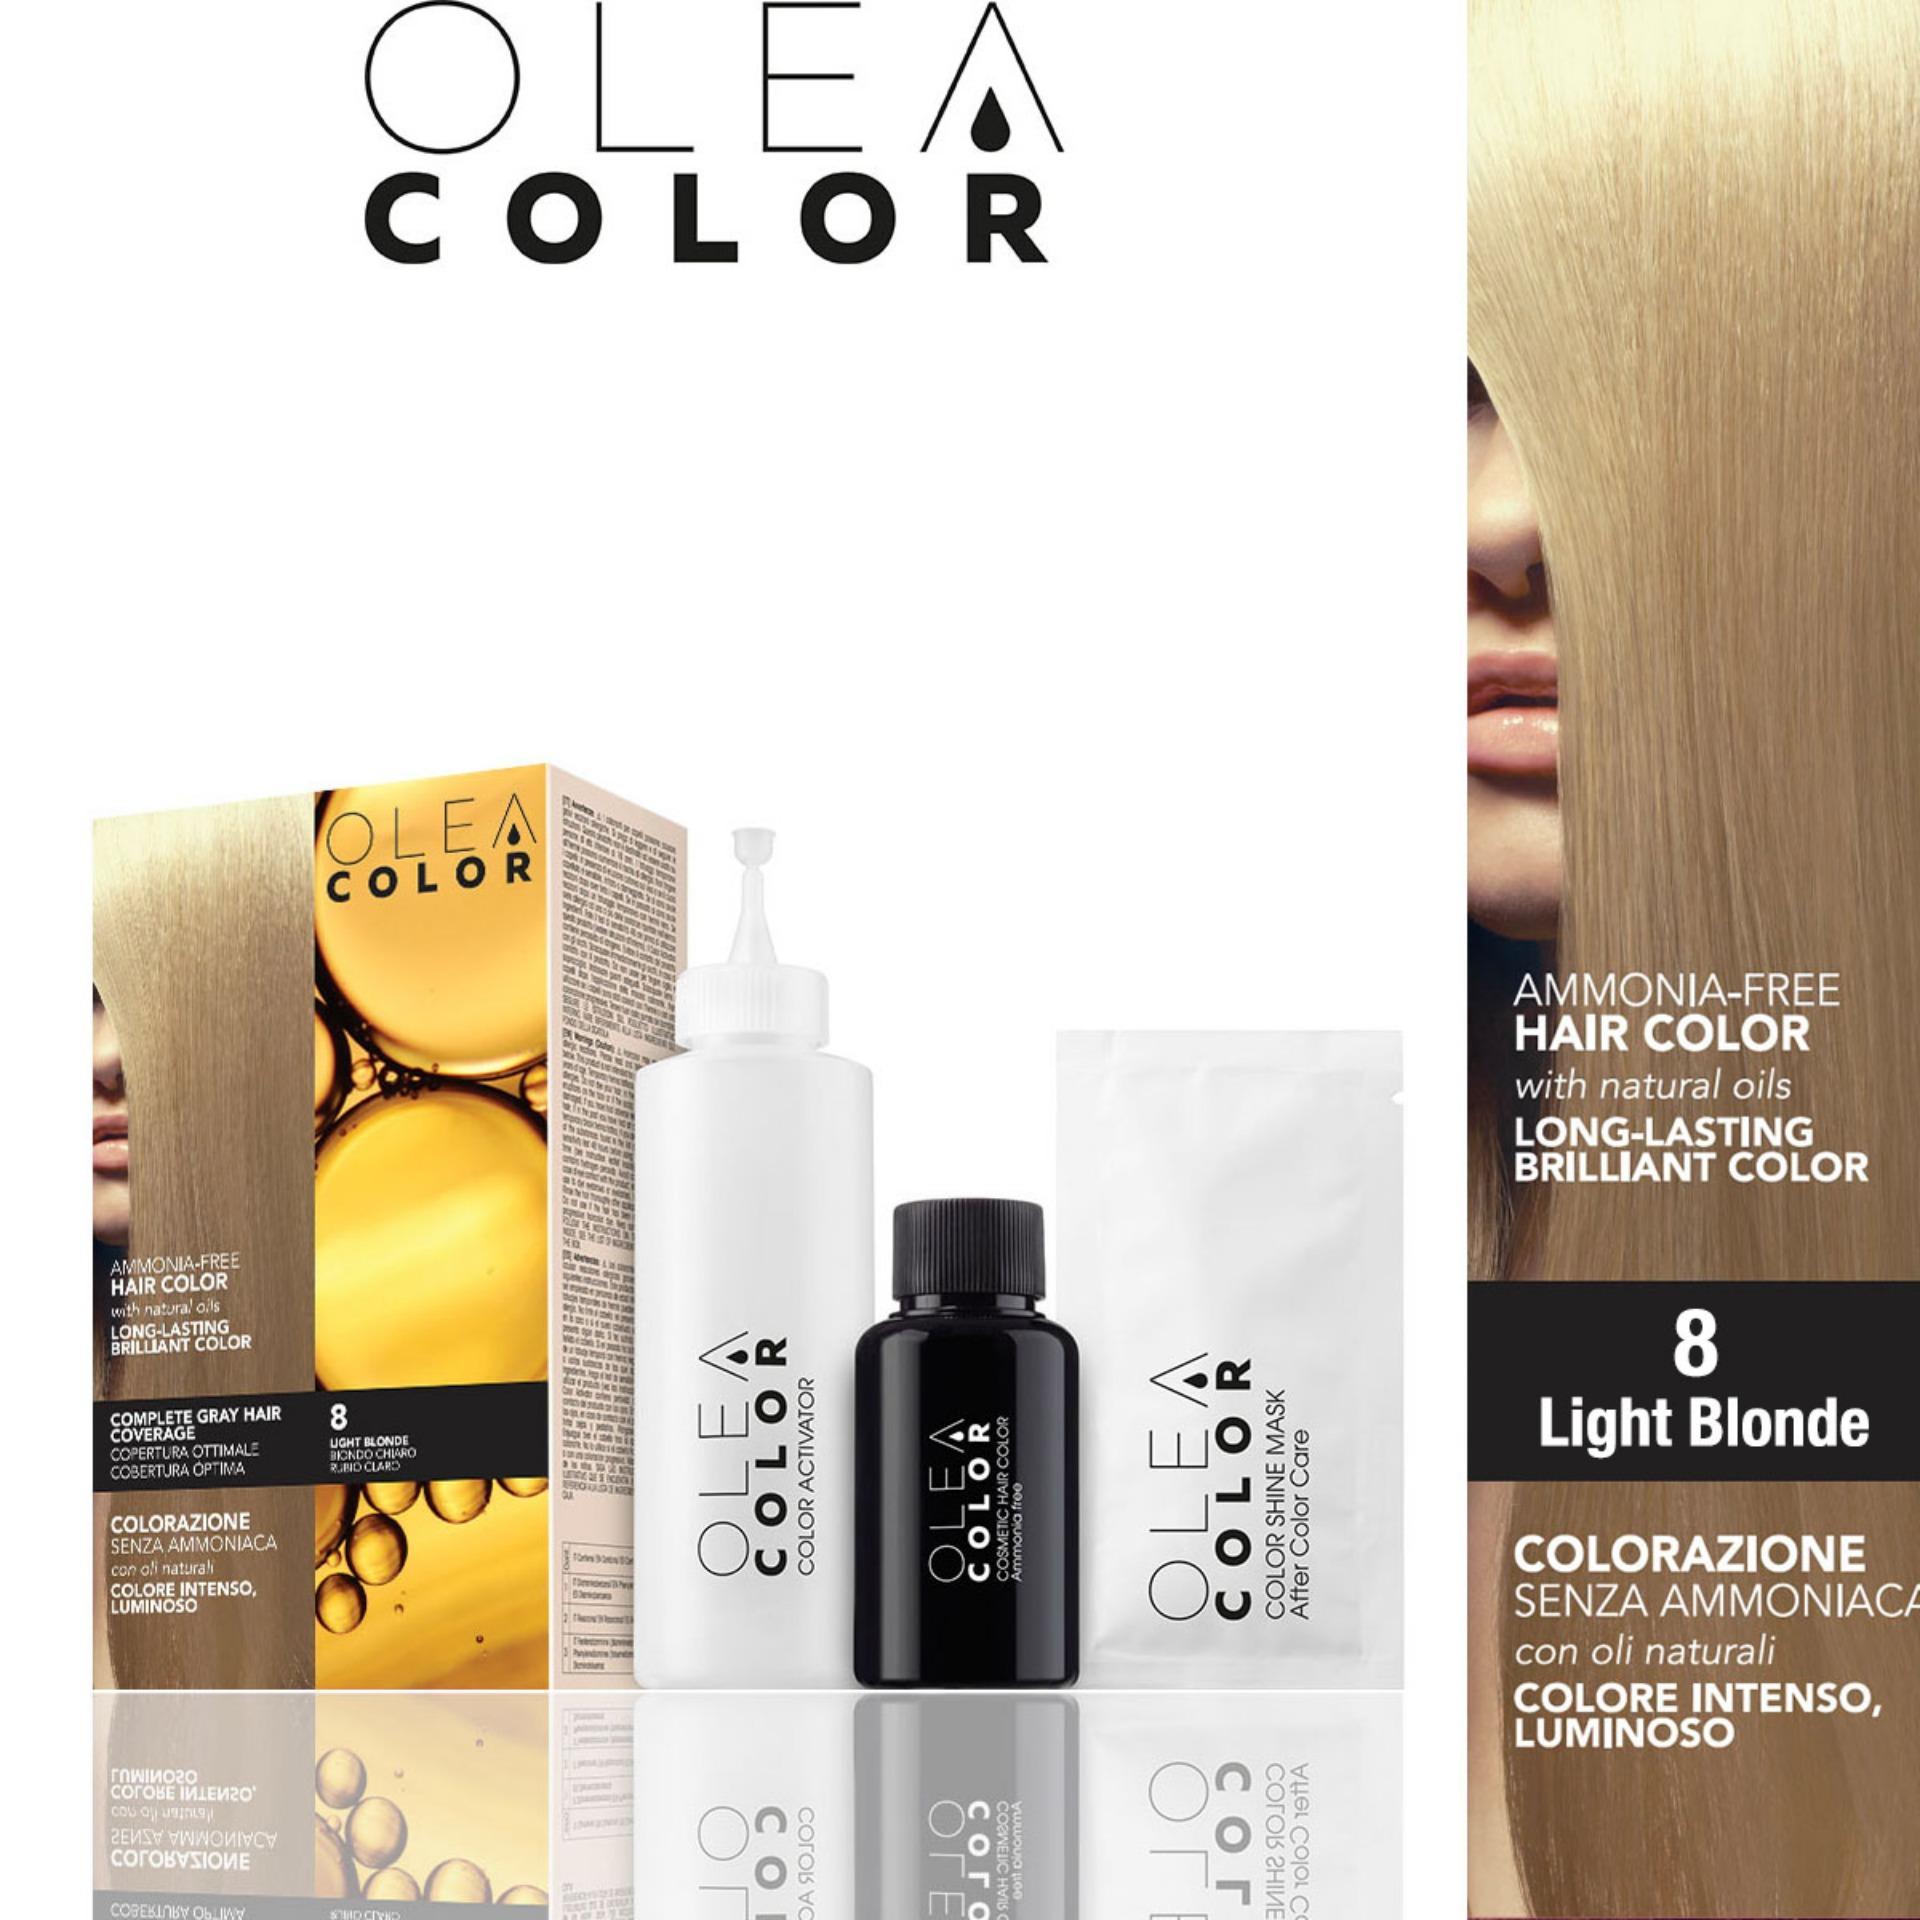 Kem nhuộm dưỡng tóc không Amoniac Olea Color ITALY màu 8 Light Blonde